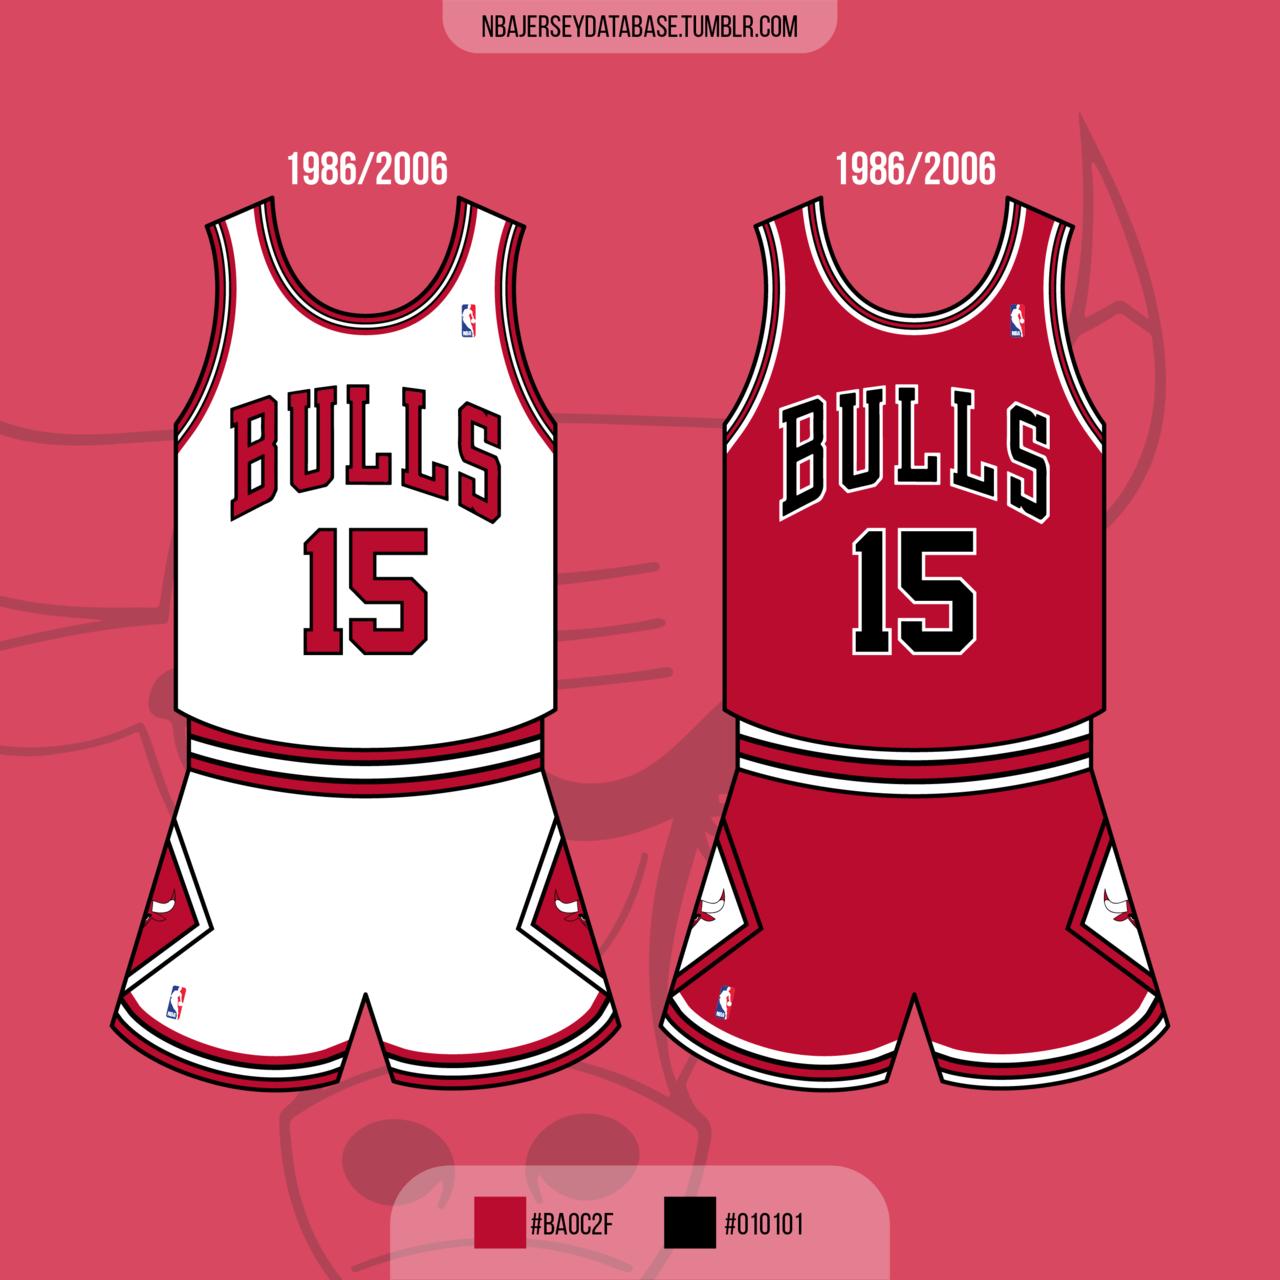 Chicago Bulls 1986-2006 Record: 889-719 (55%)